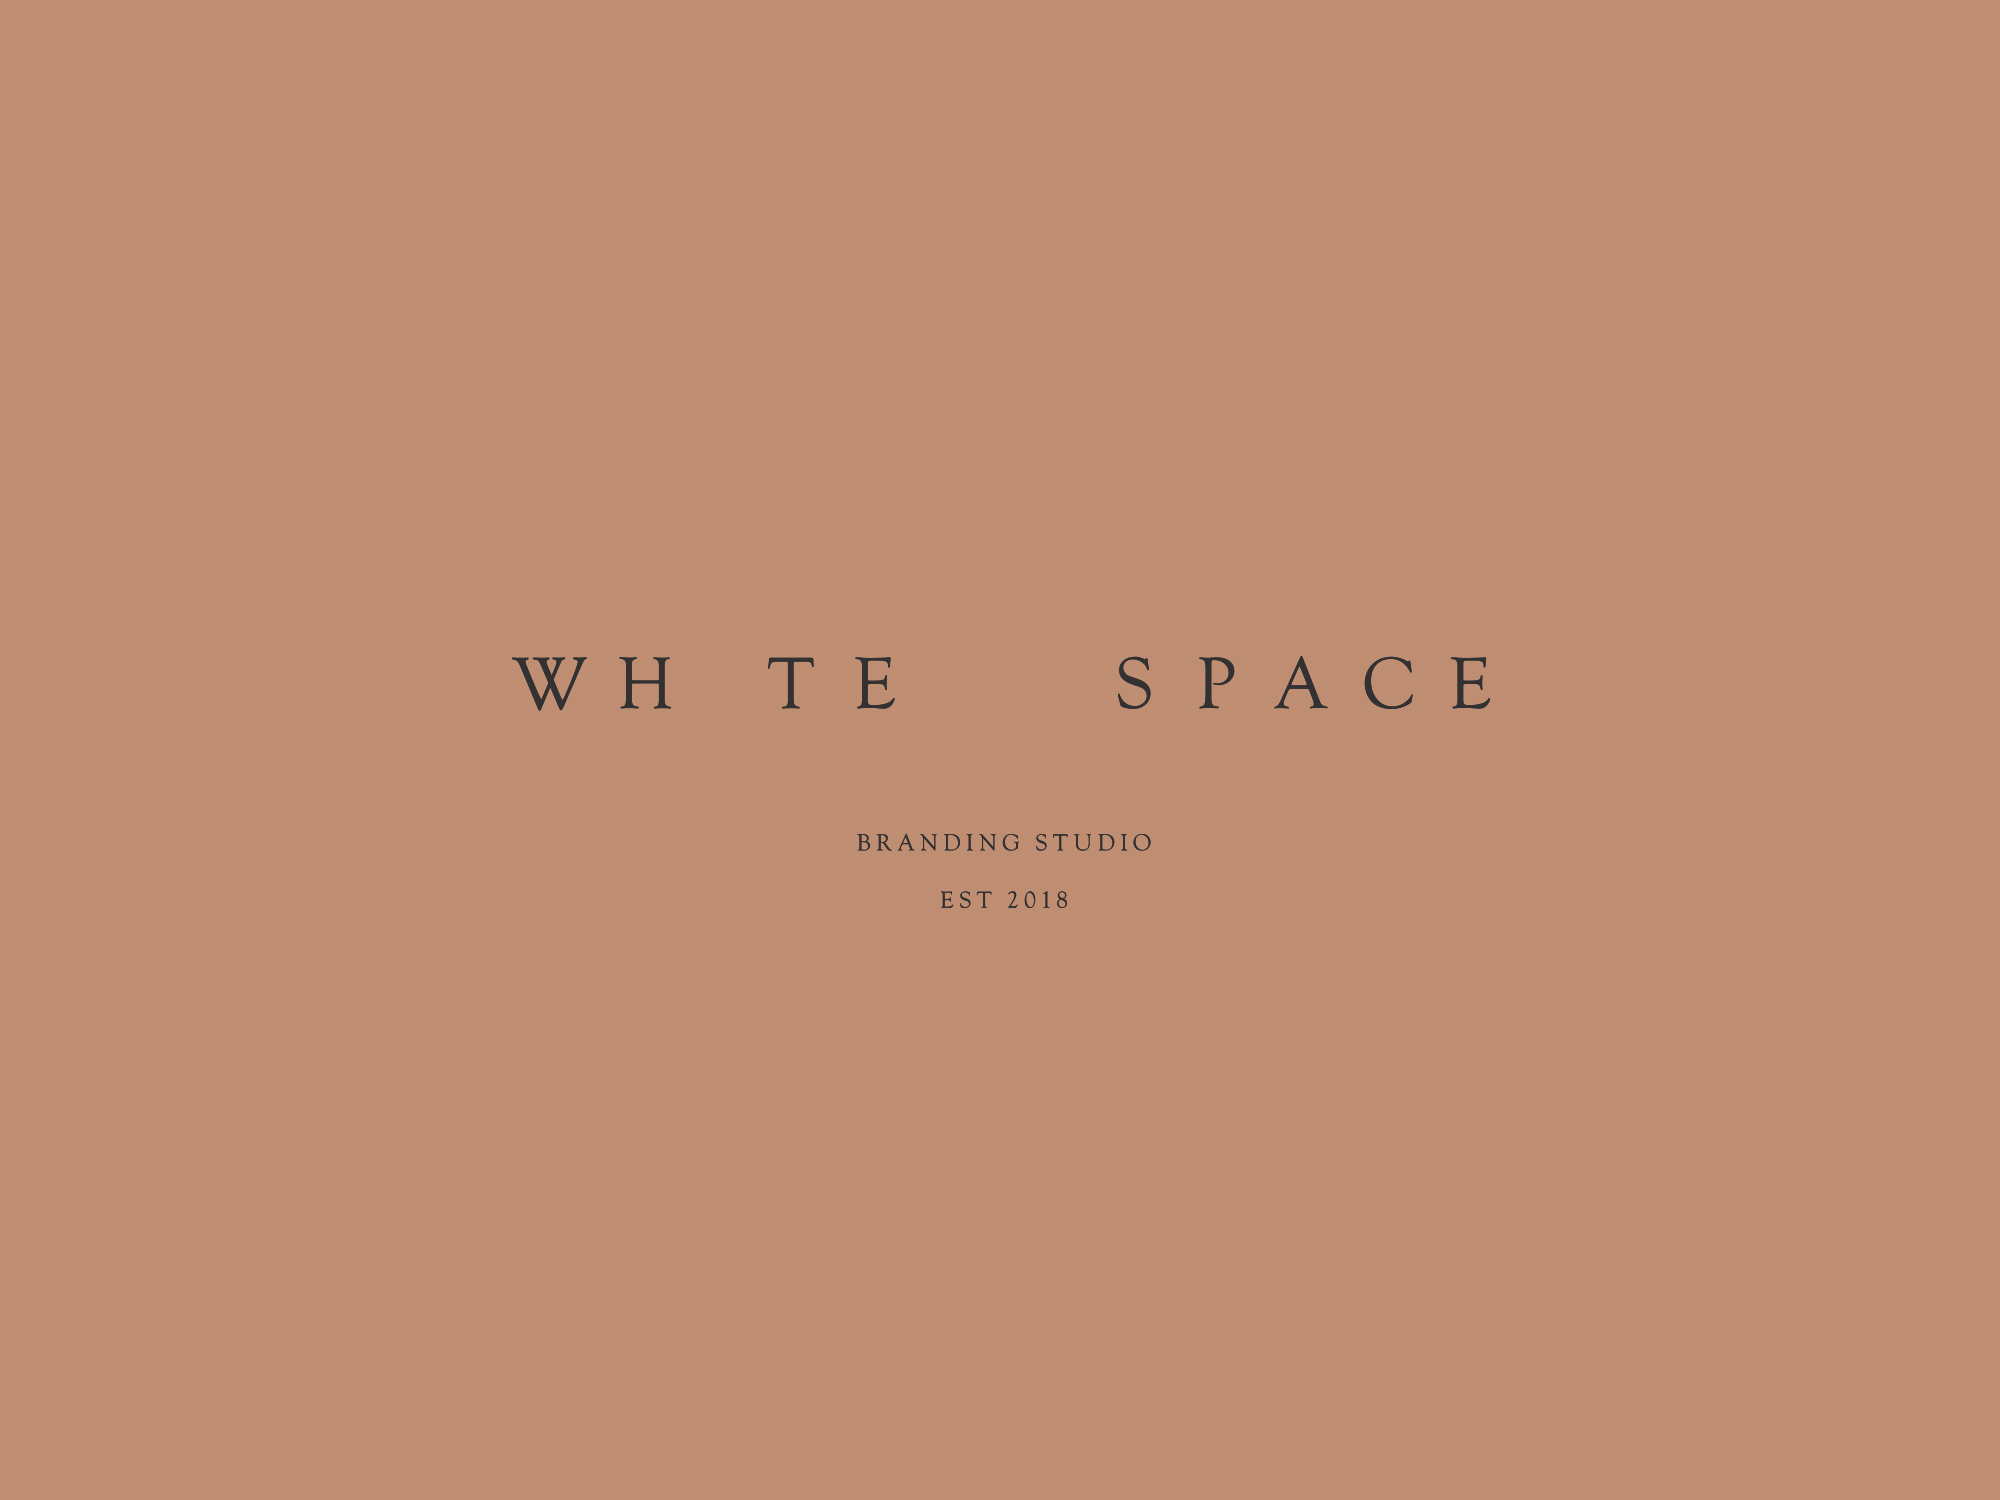 WhteSpace-4.jpg